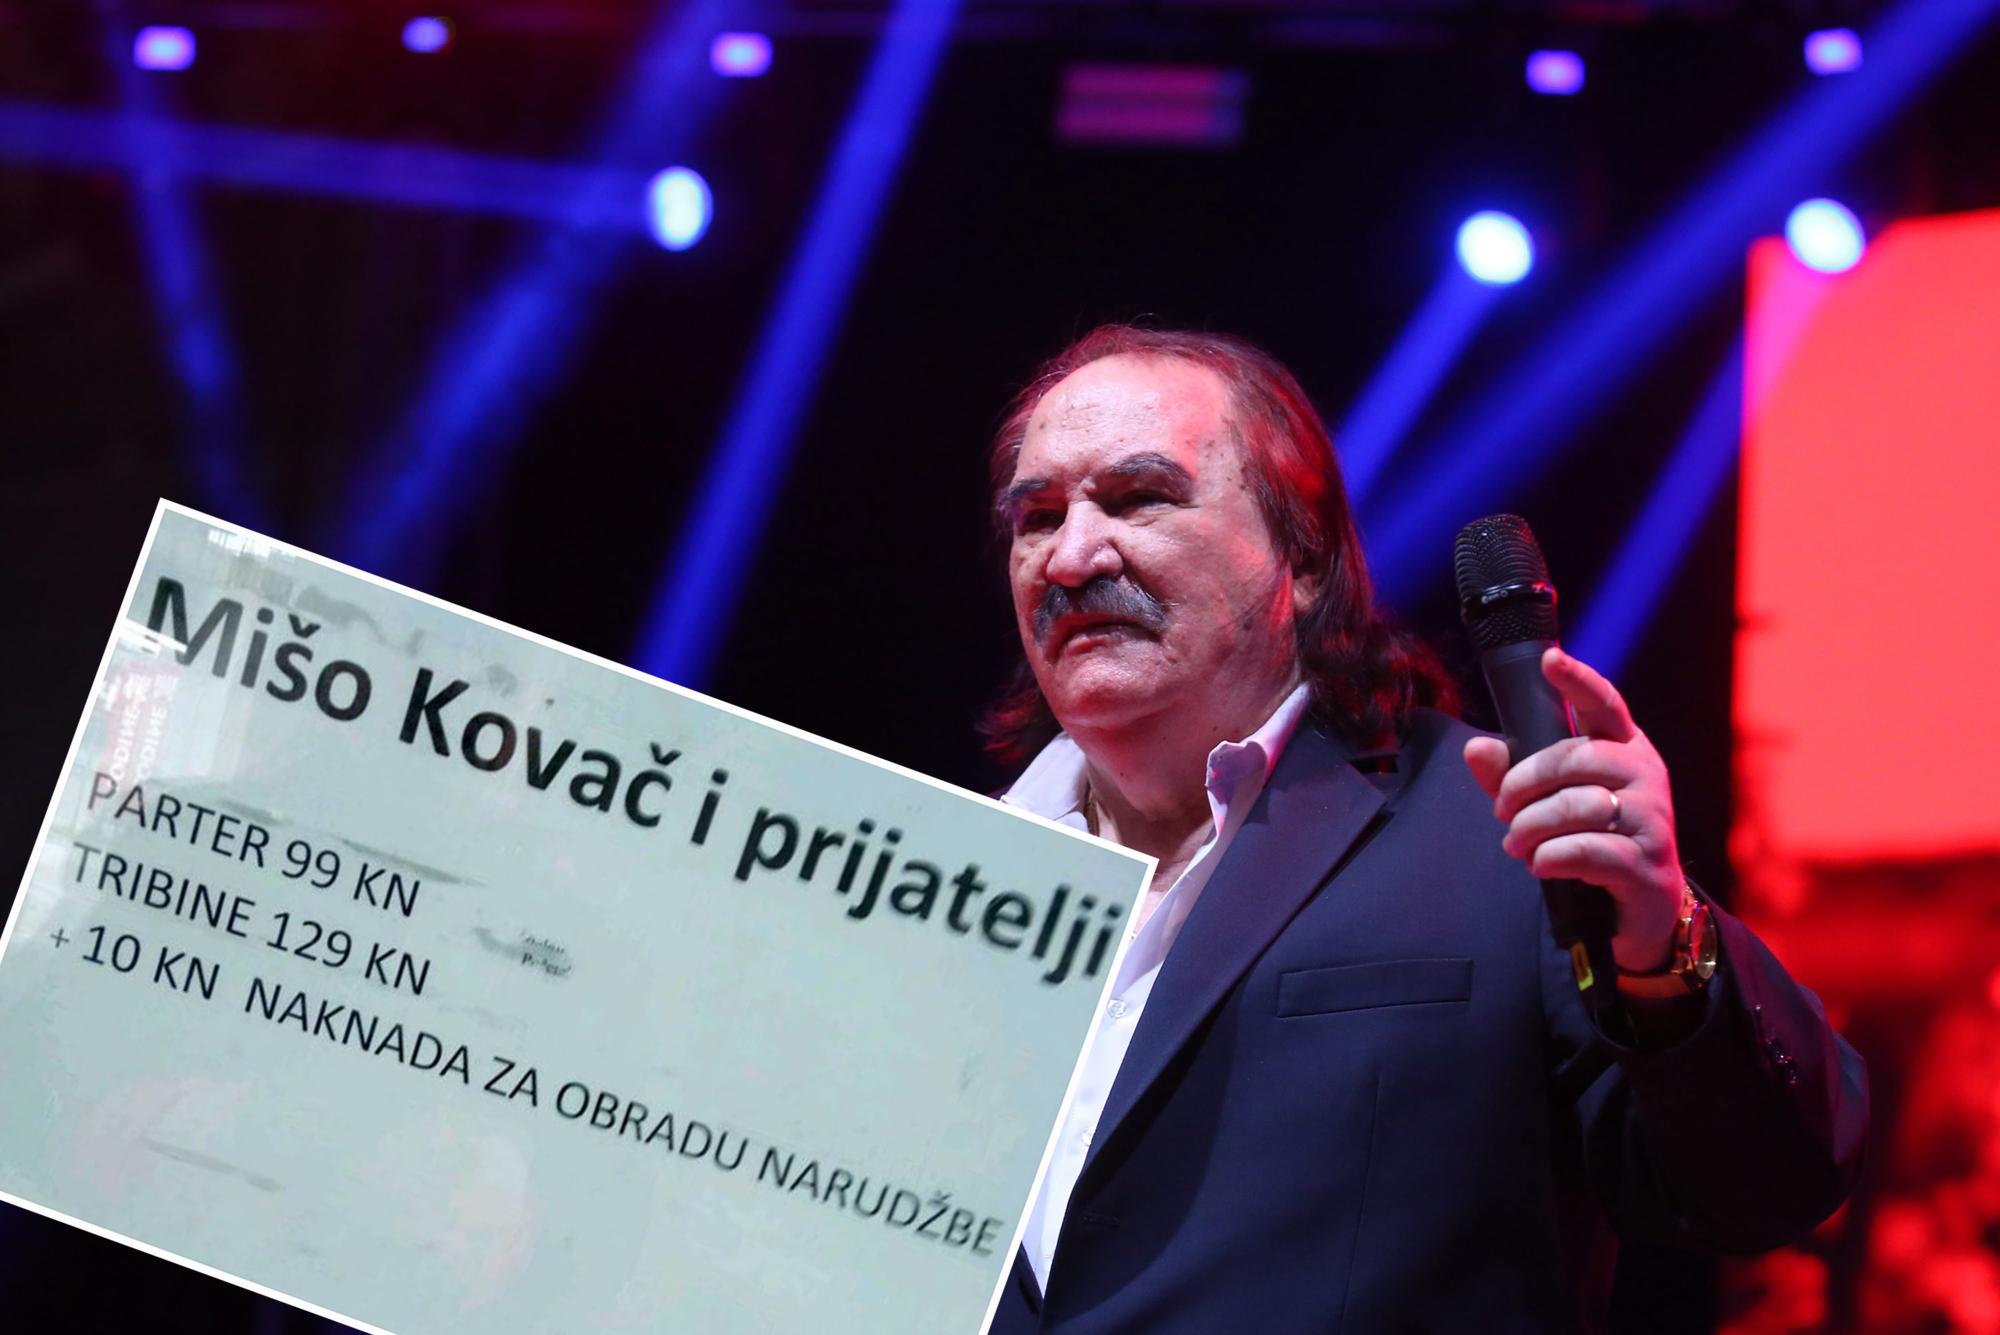 hrvatska_noc100-171118_2